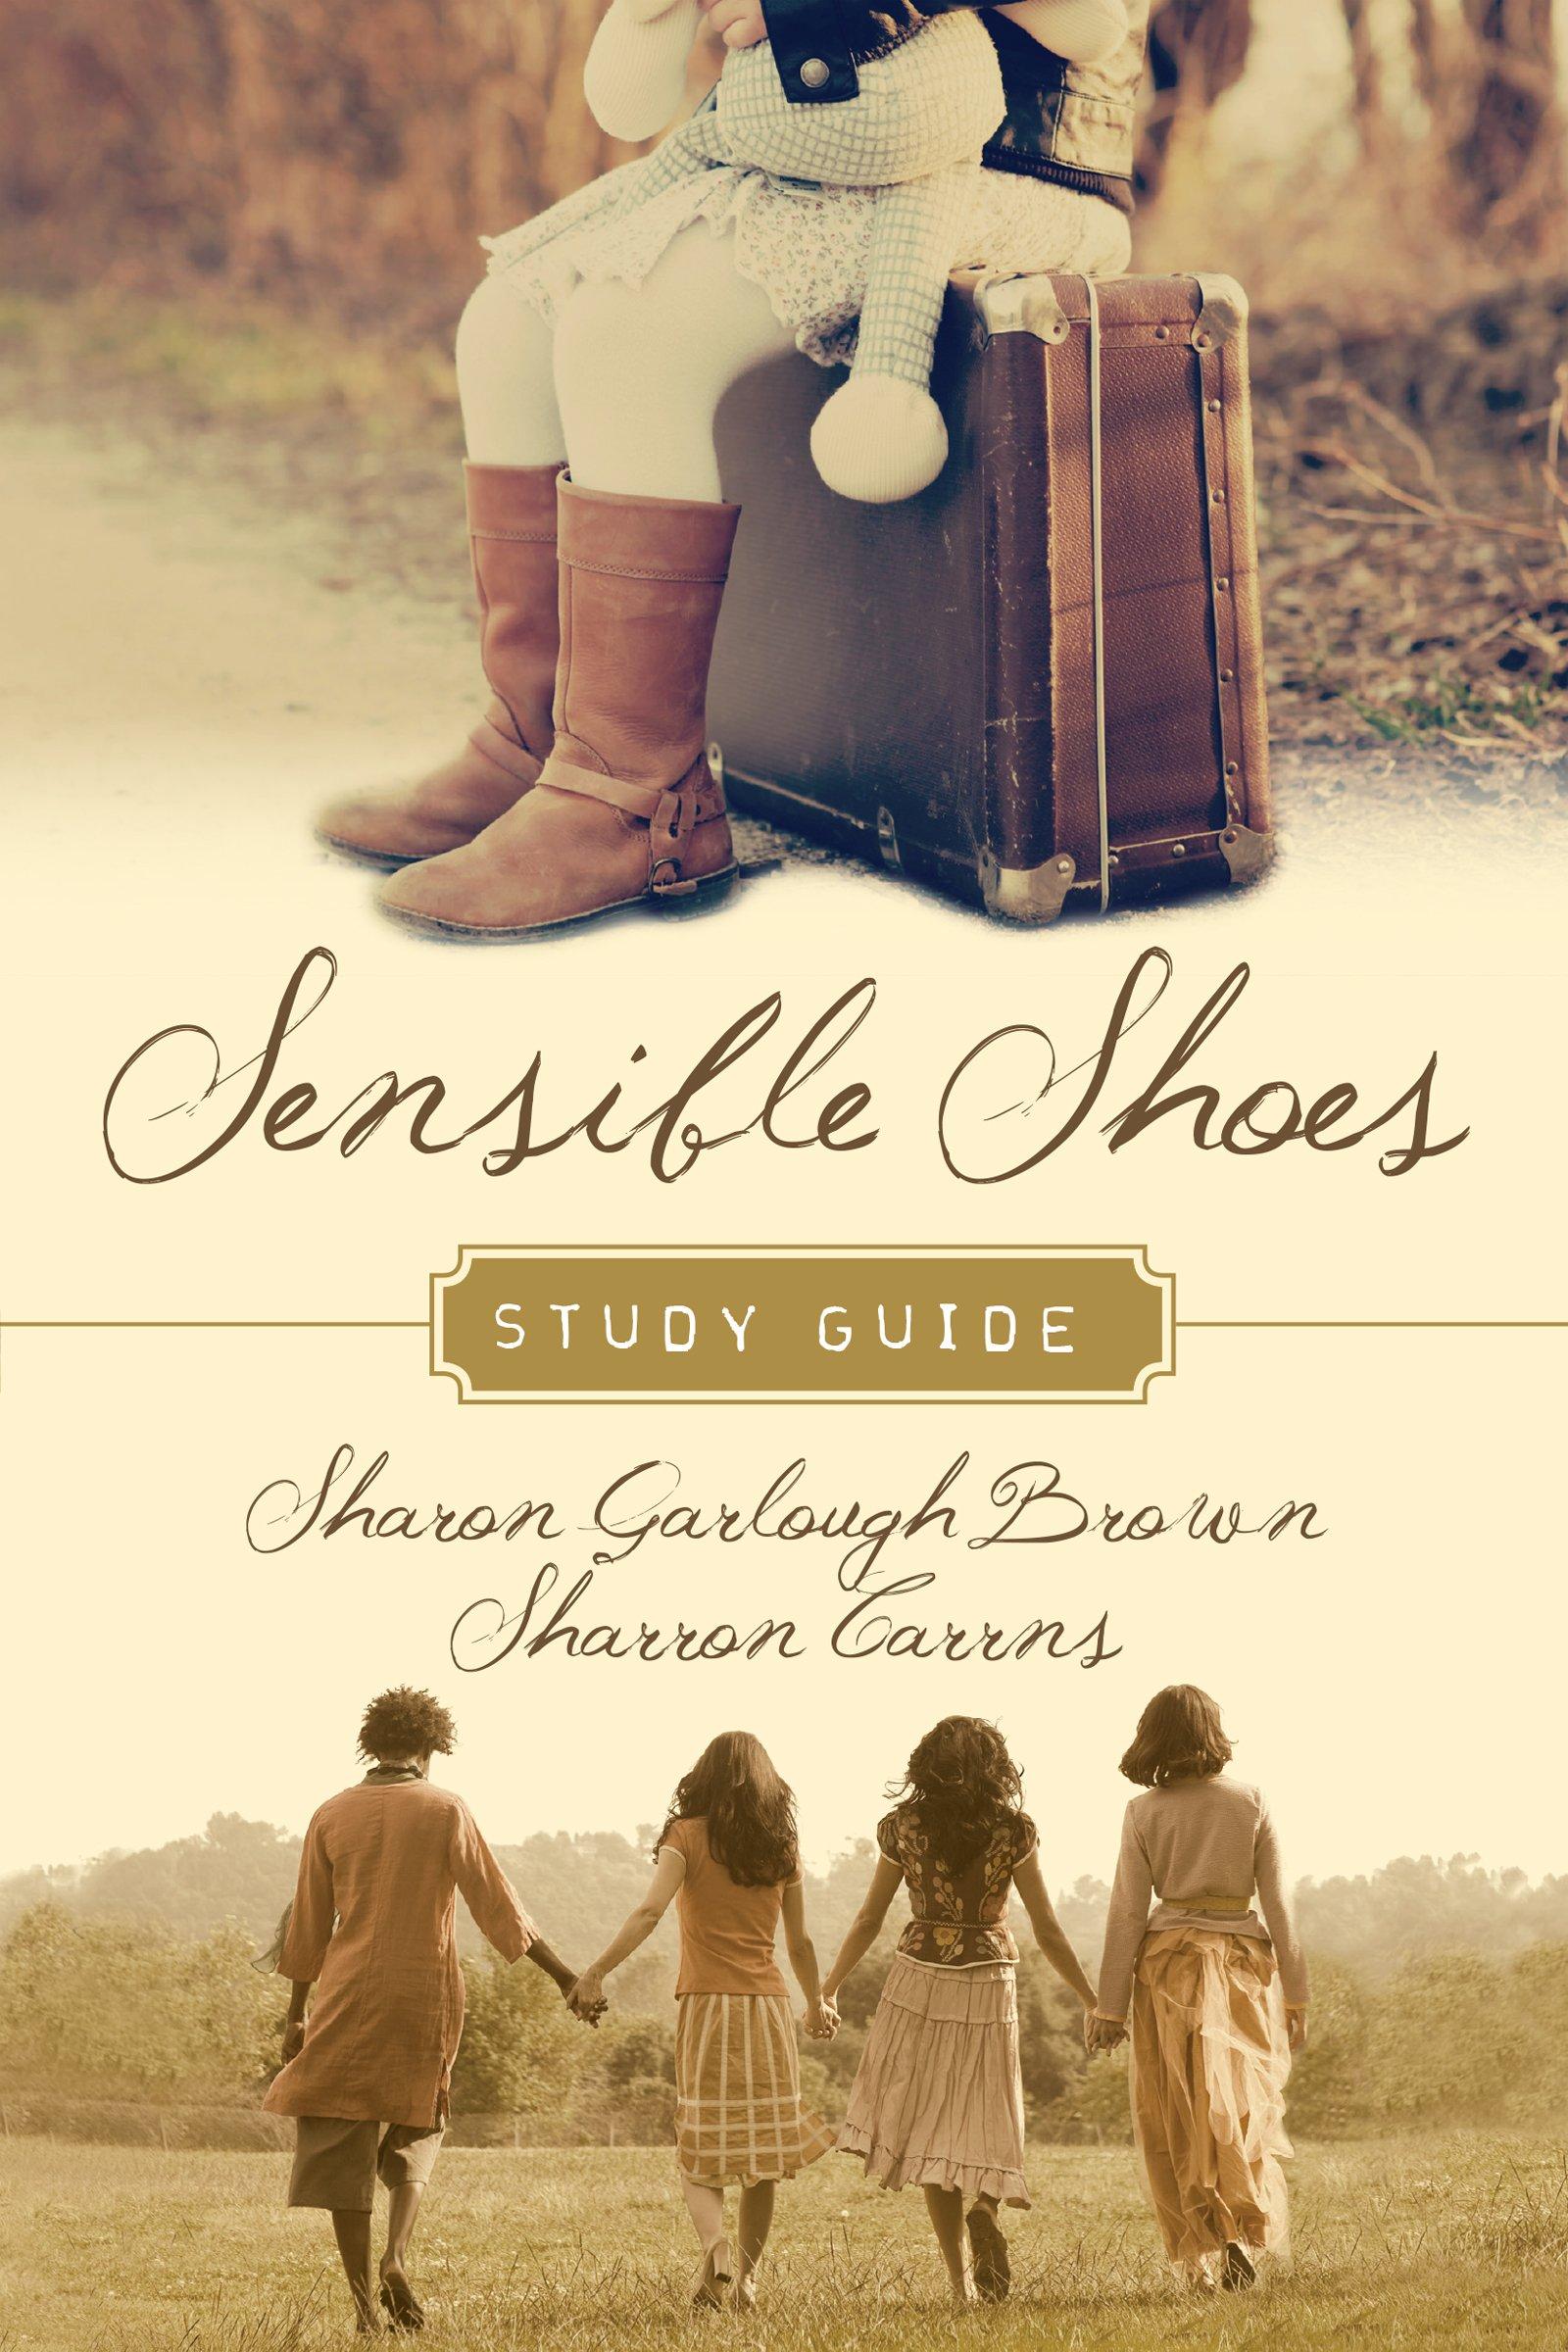 Sensible Shoes Study Guide ebook